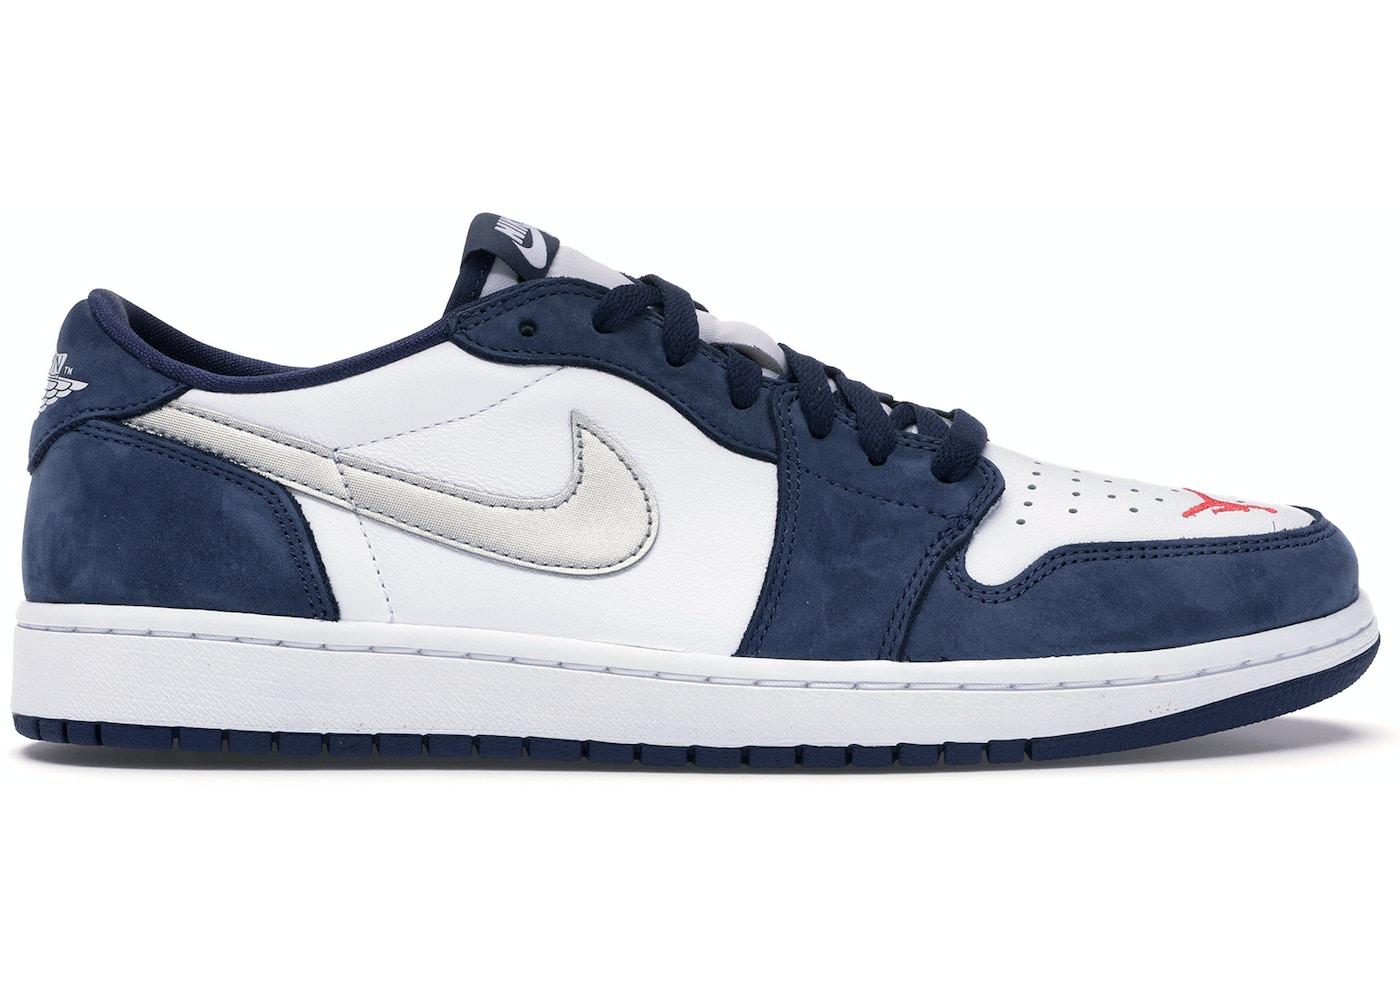 buy popular bfd42 bdc88 Buy   Sell Deadstock Shoes - Real Yeezys, Retro Jordans, Nike